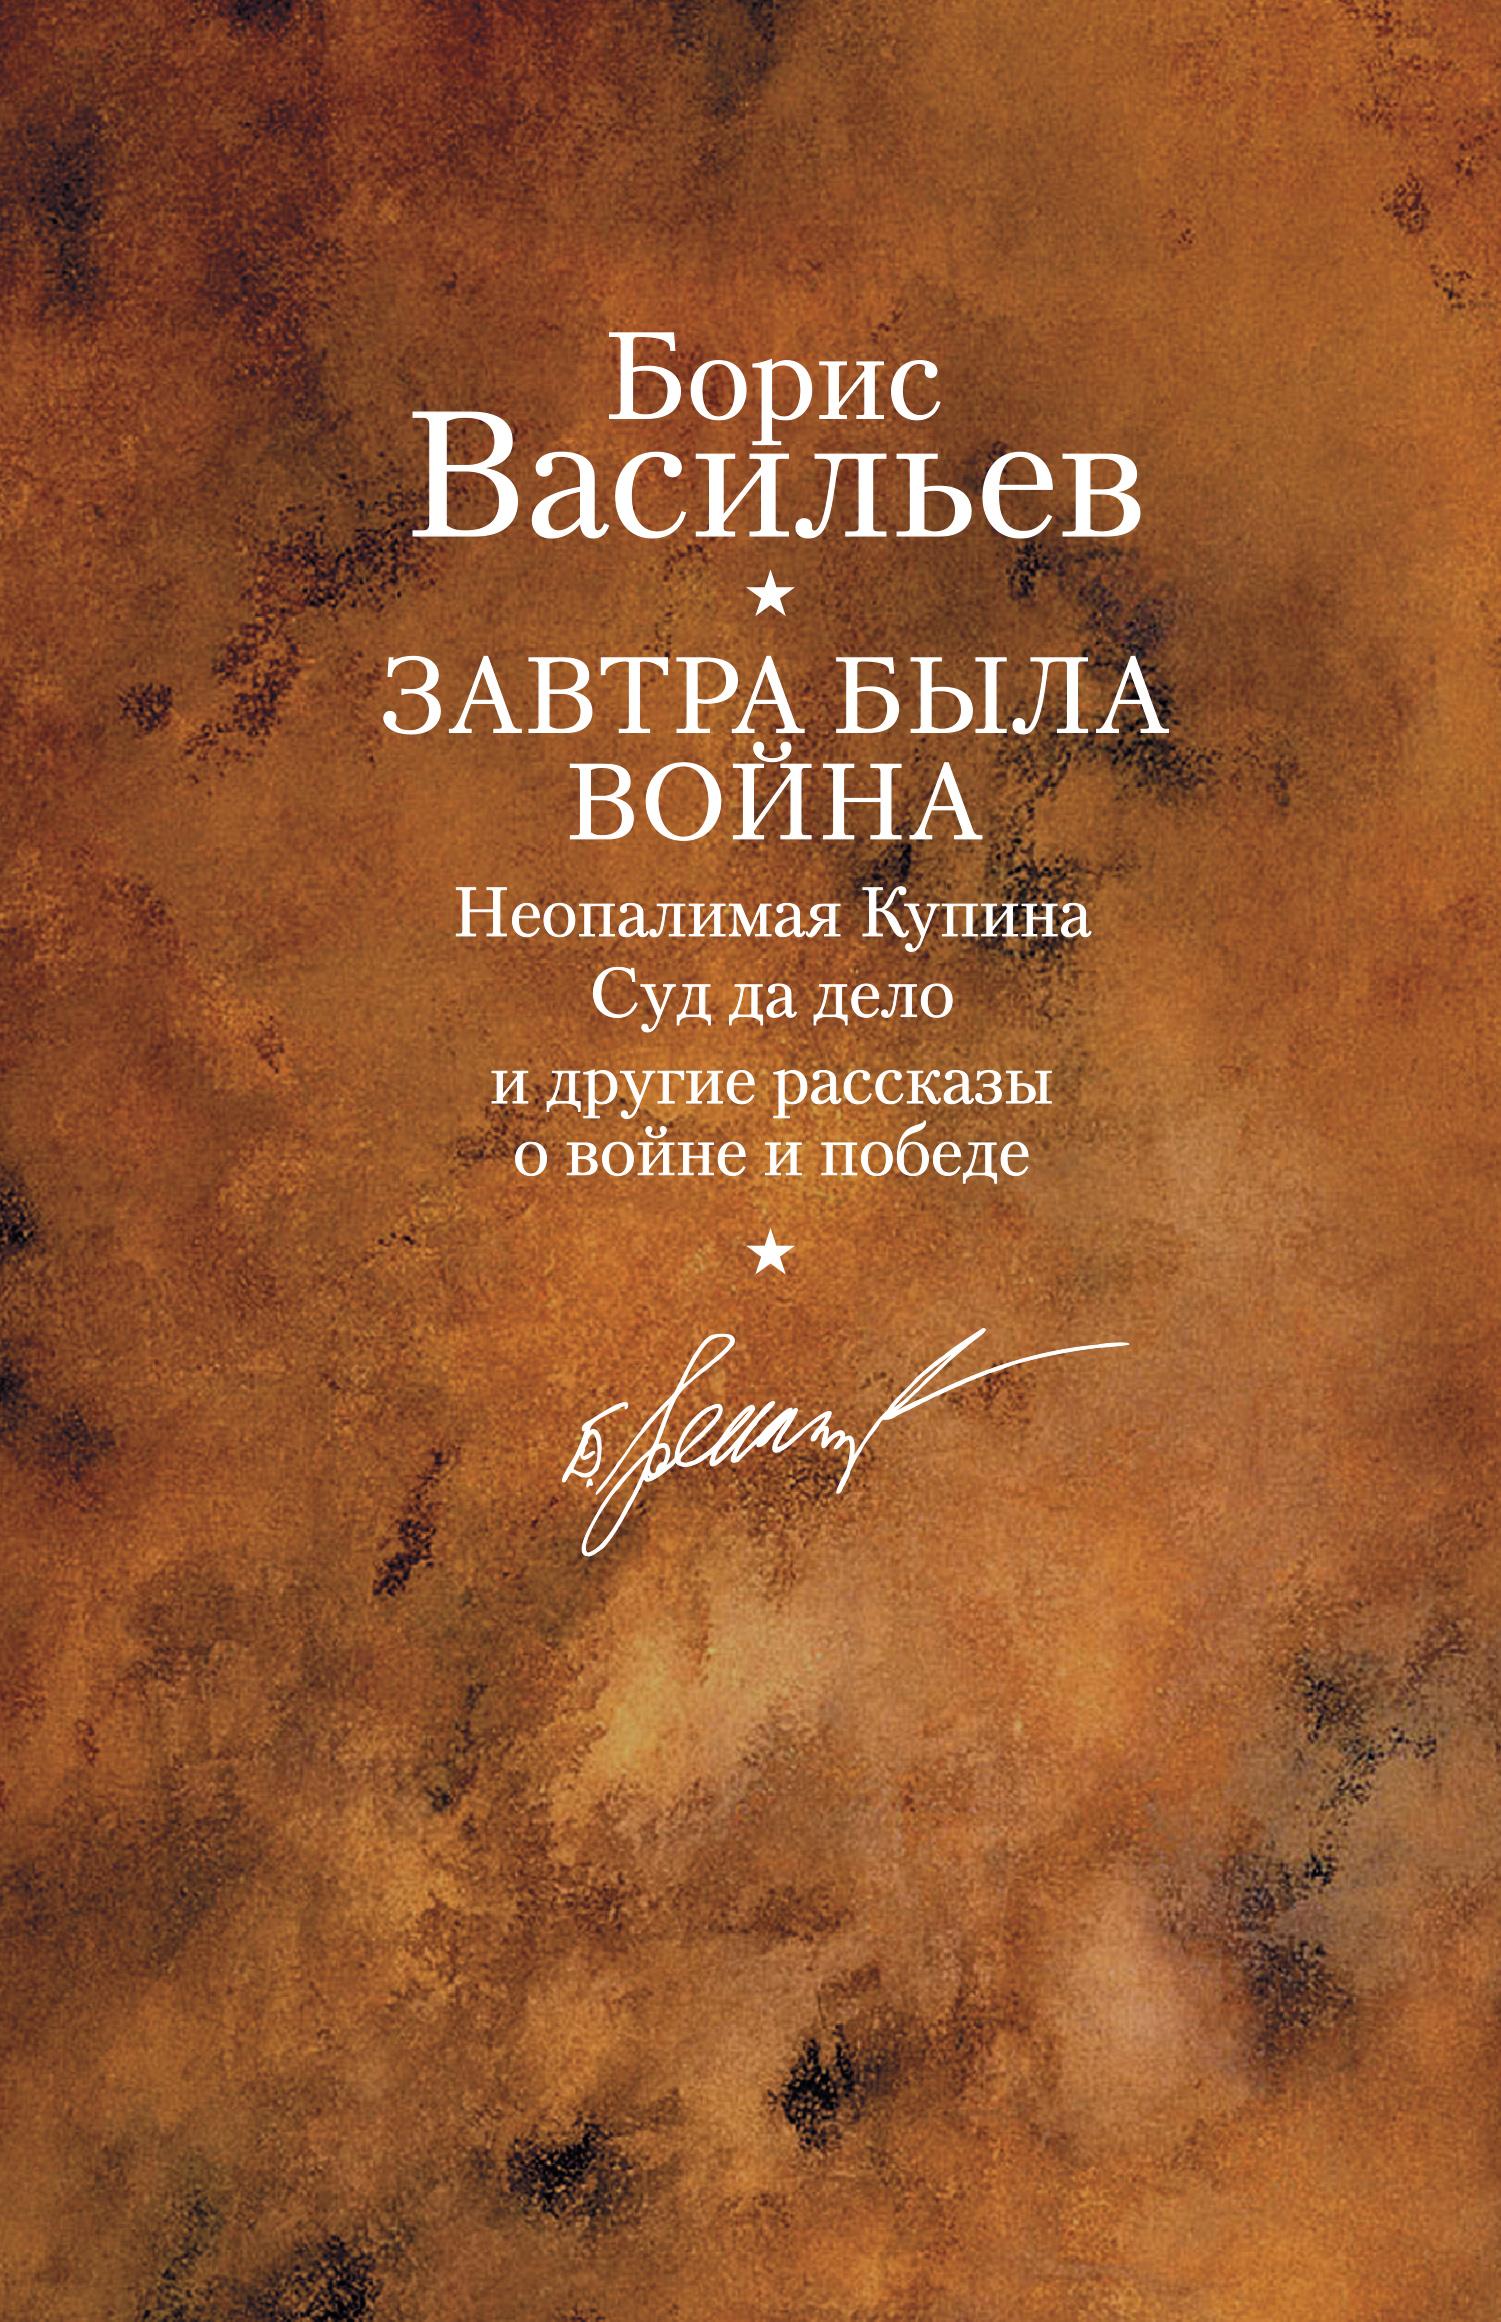 Борис Васильев Старая «Олимпия» борис васильев ветеран